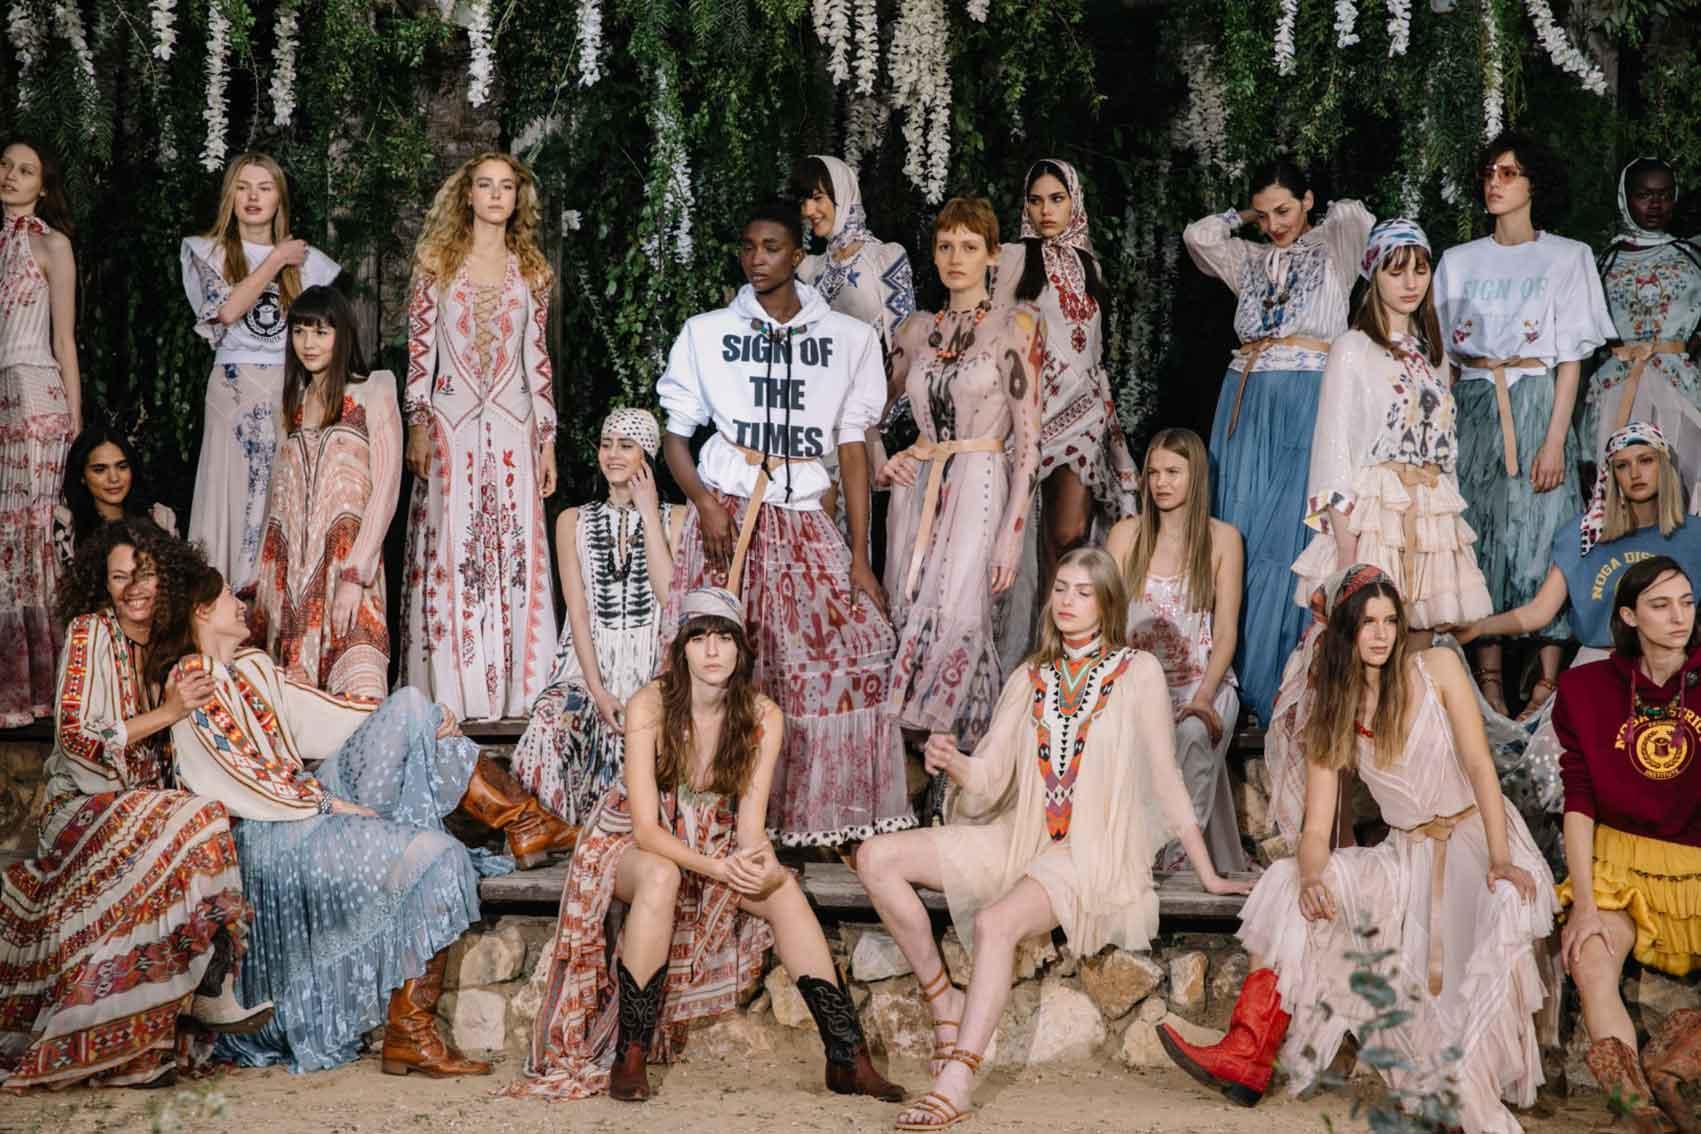 Vivi-Bellaish-Tel-Aviv-Korint-Fashion-Week-2021-Reshset-13-photo-by-Orit...